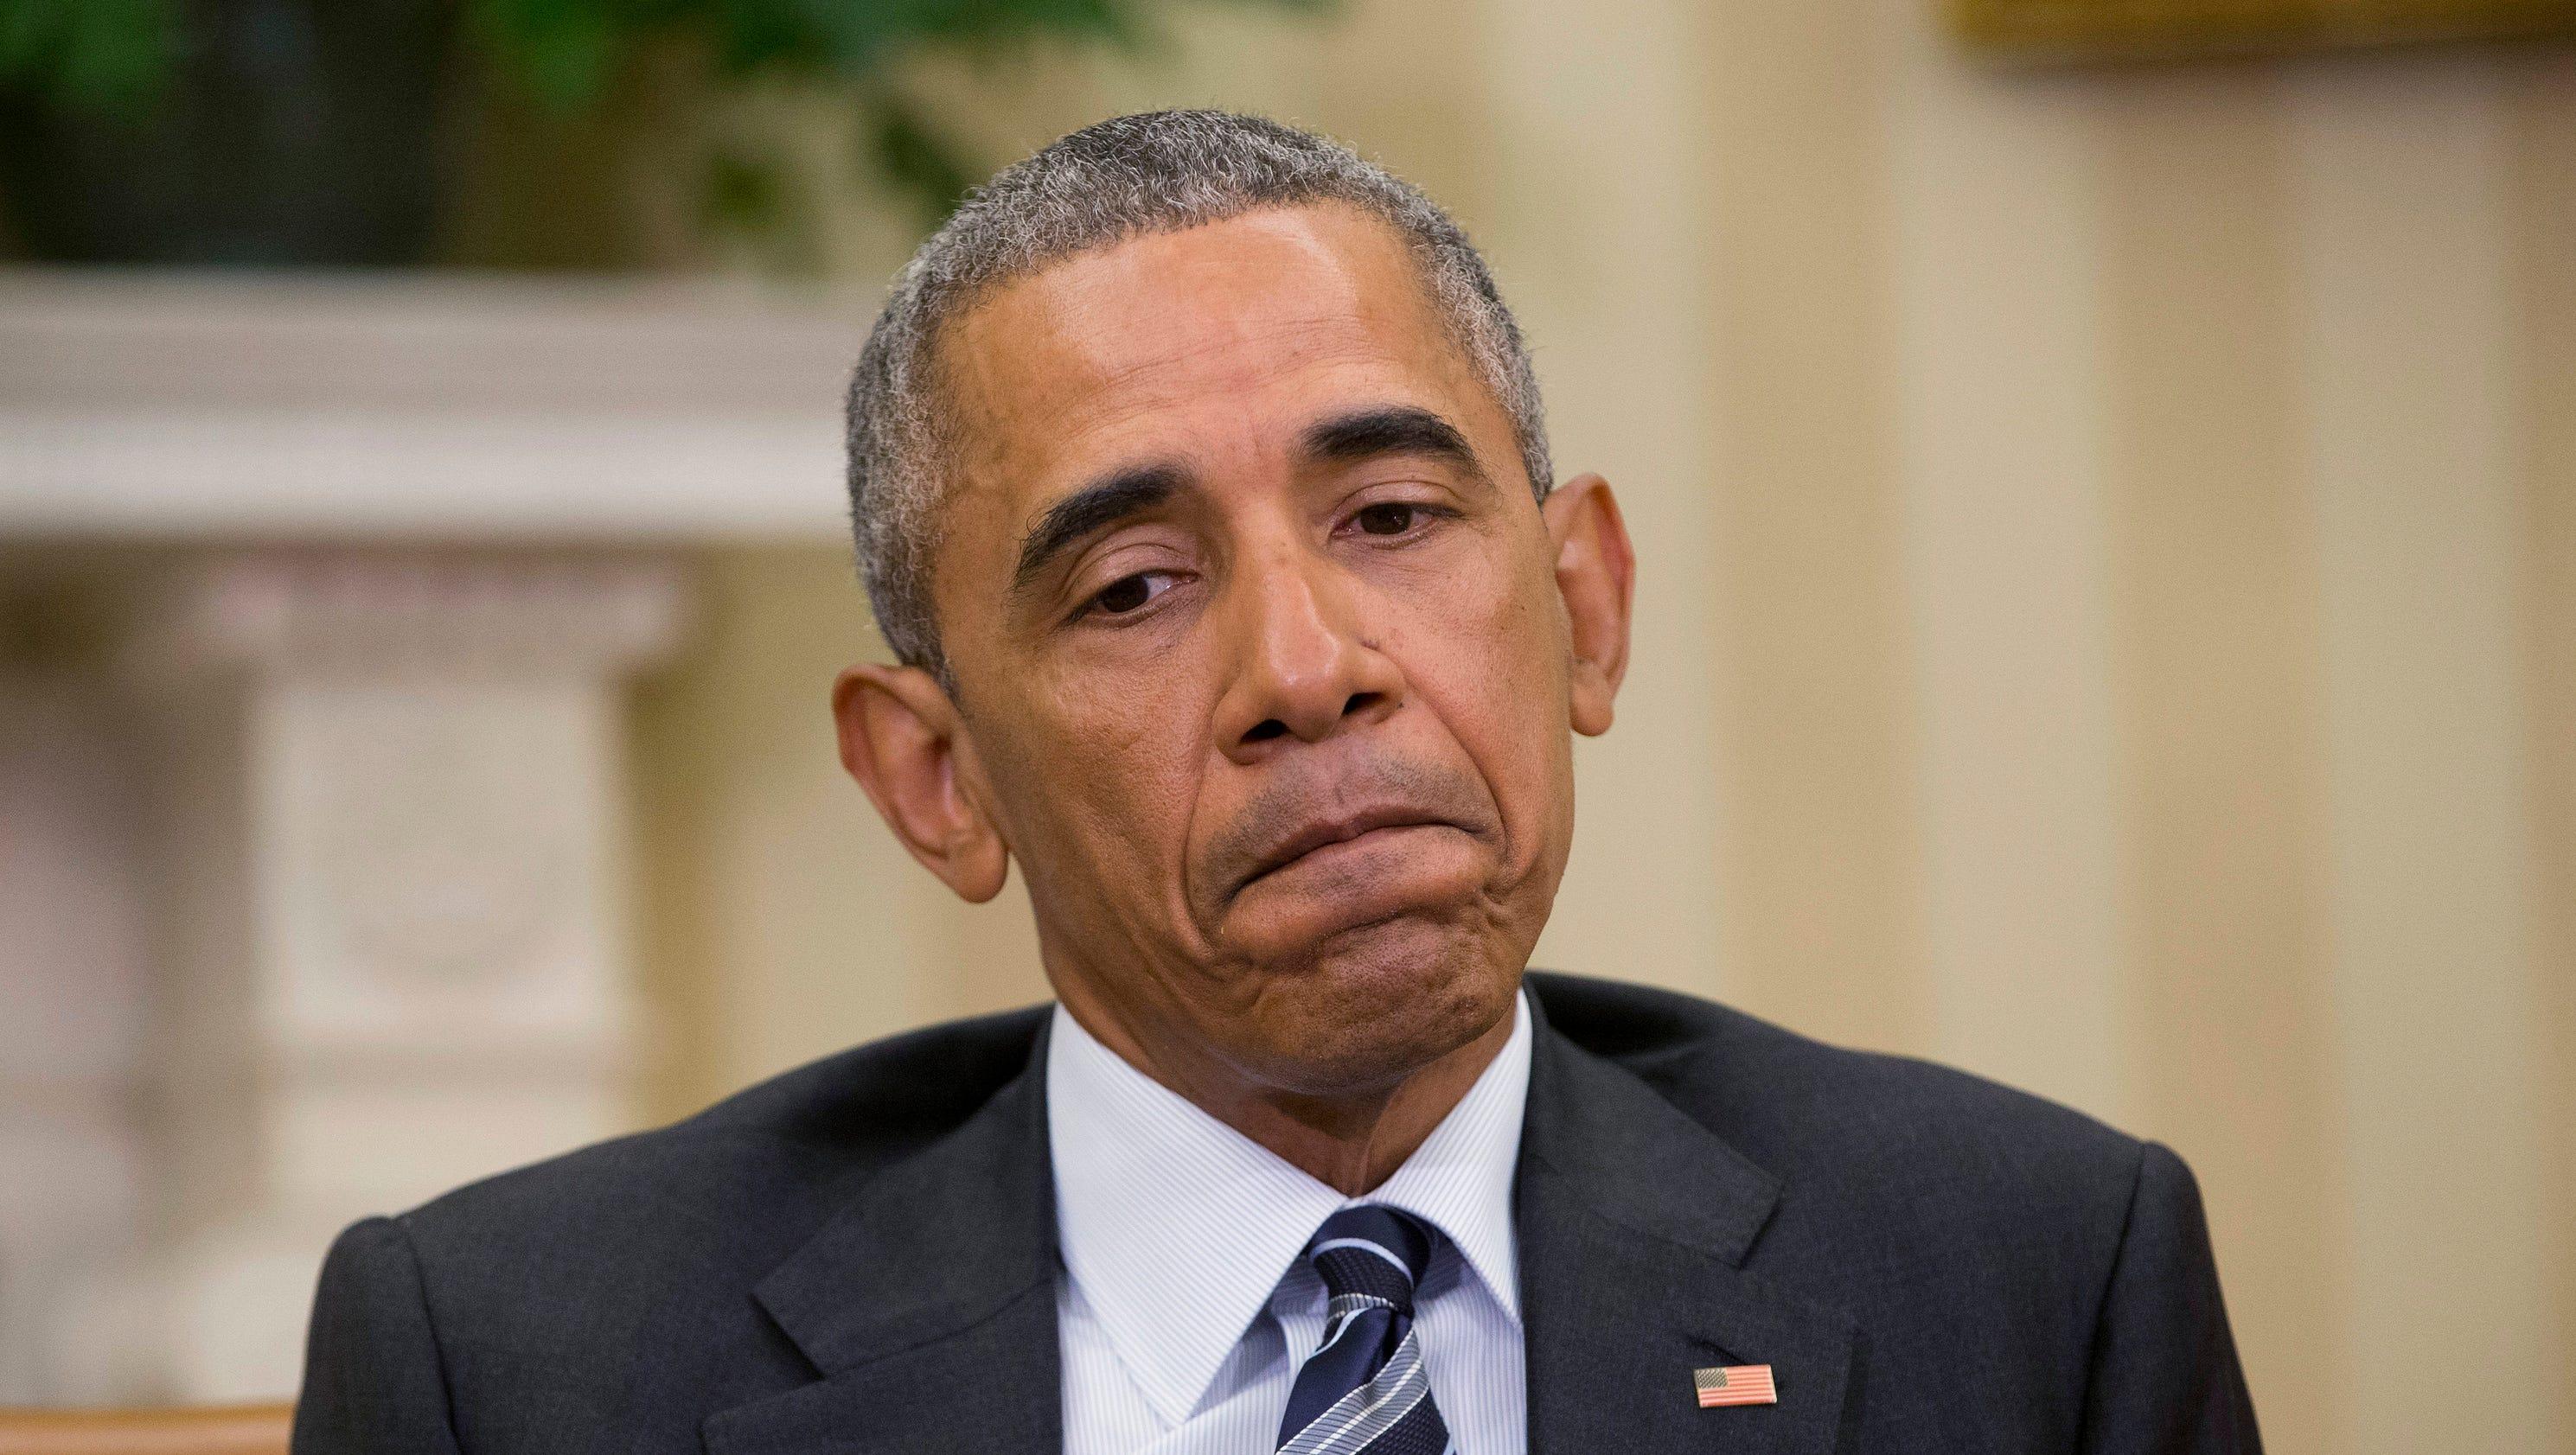 obama - photo #20